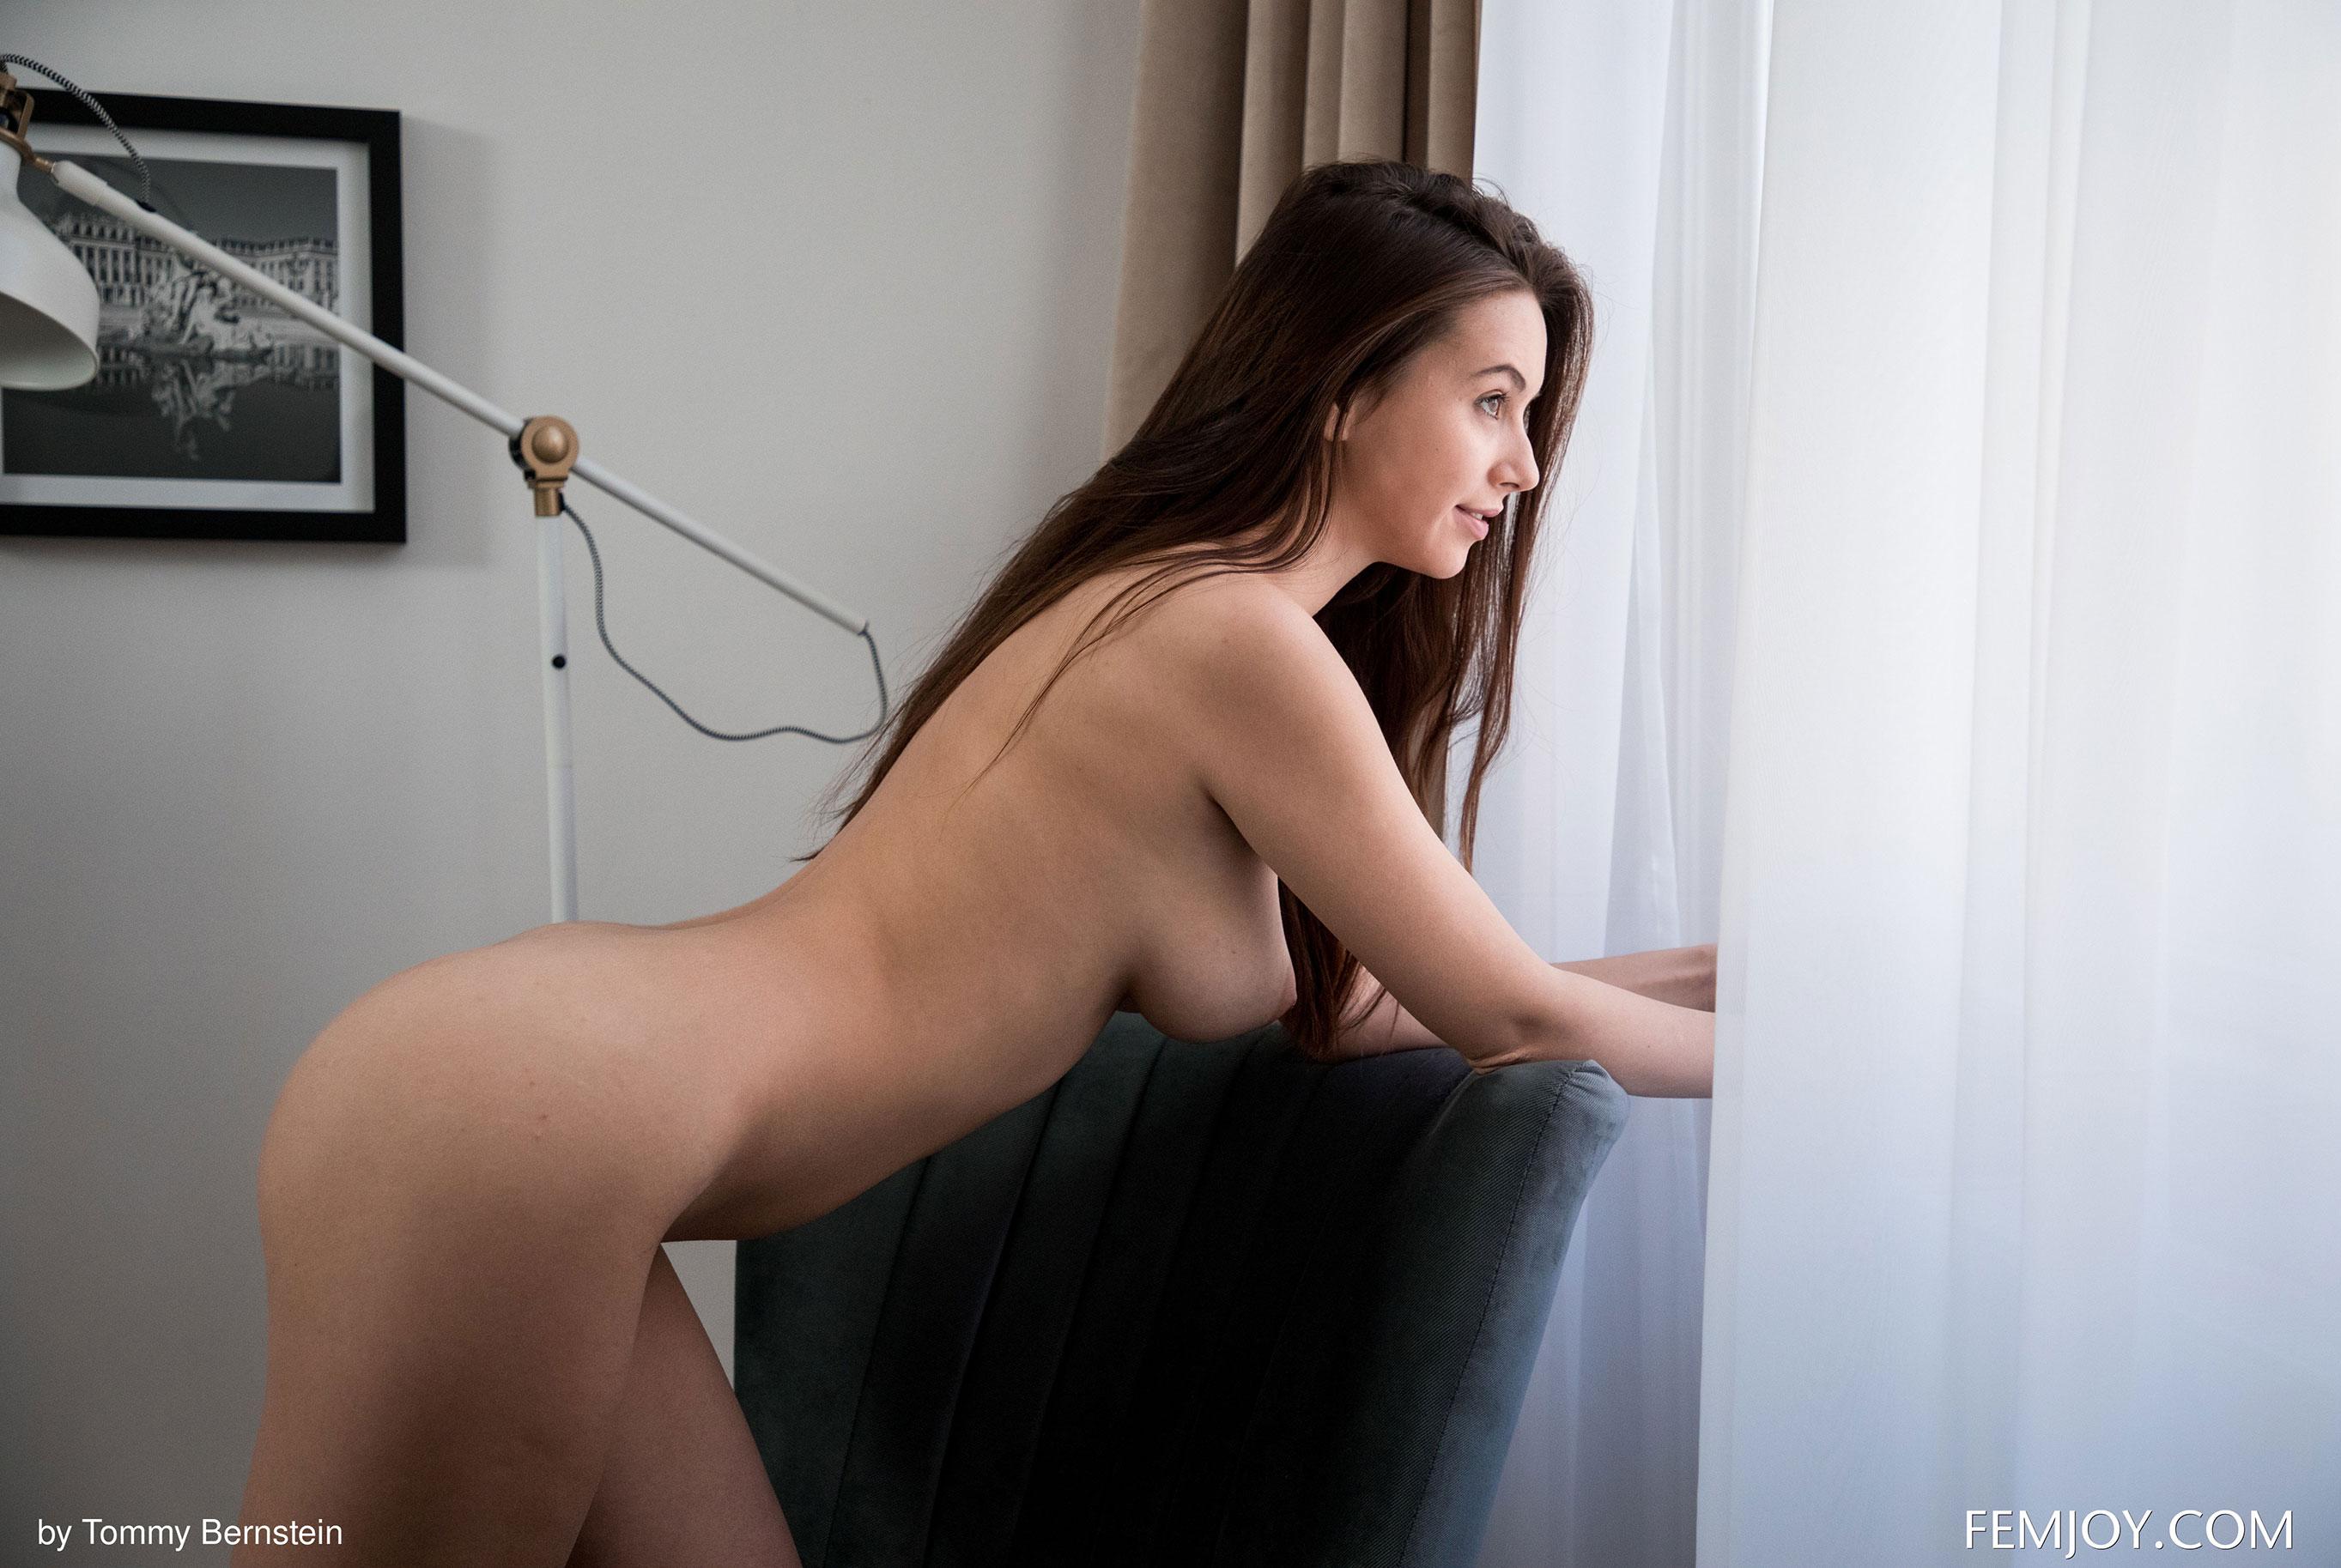 Навстречу новому дню - голая Алиса у окна / фото 04